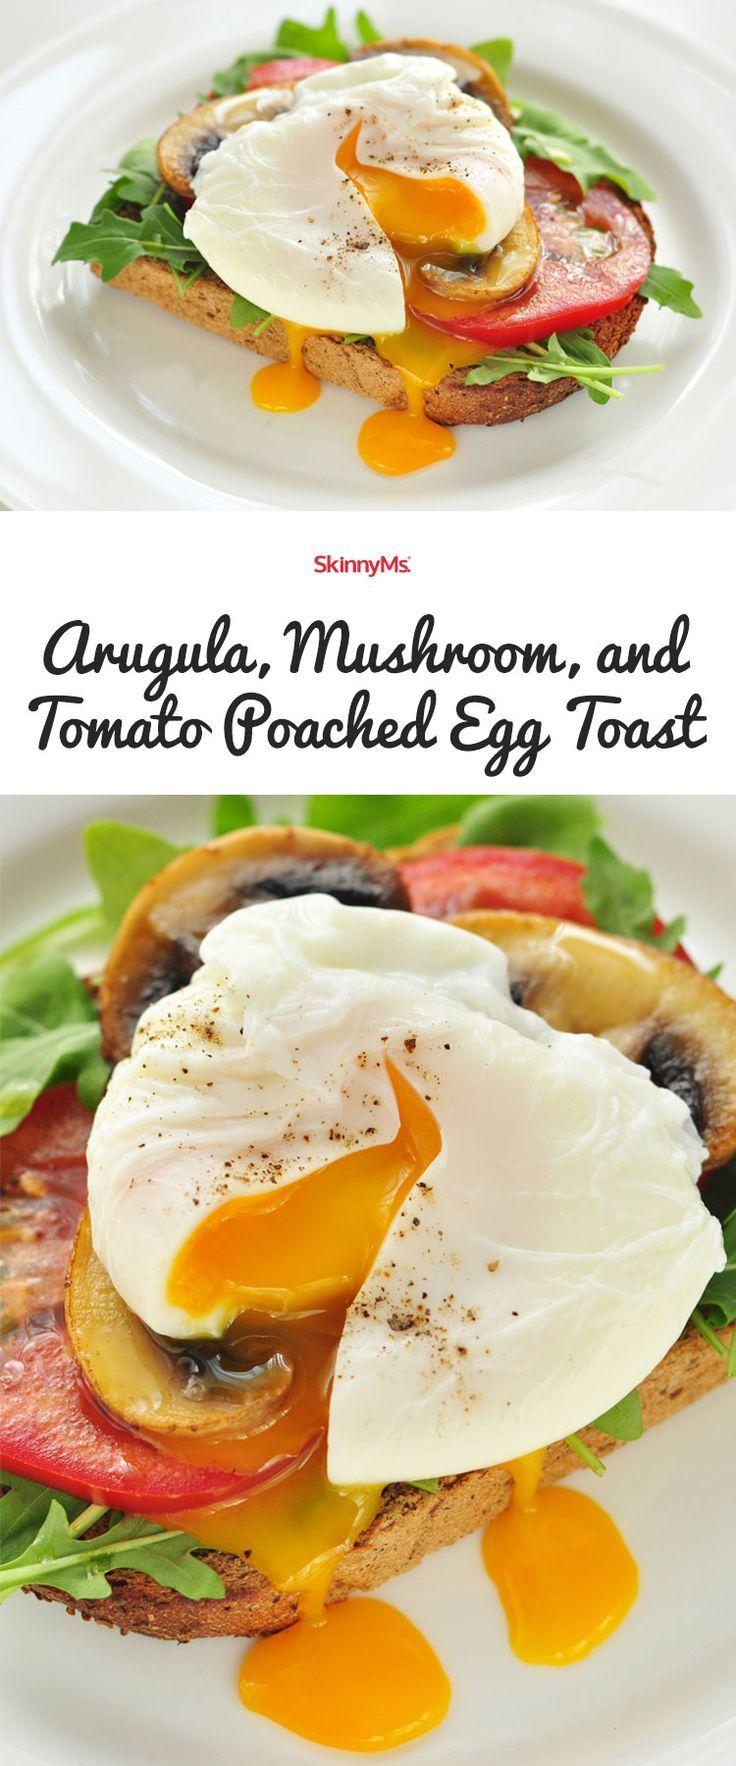 Arugula, Mushroom, and Tomato Poached Egg Toast